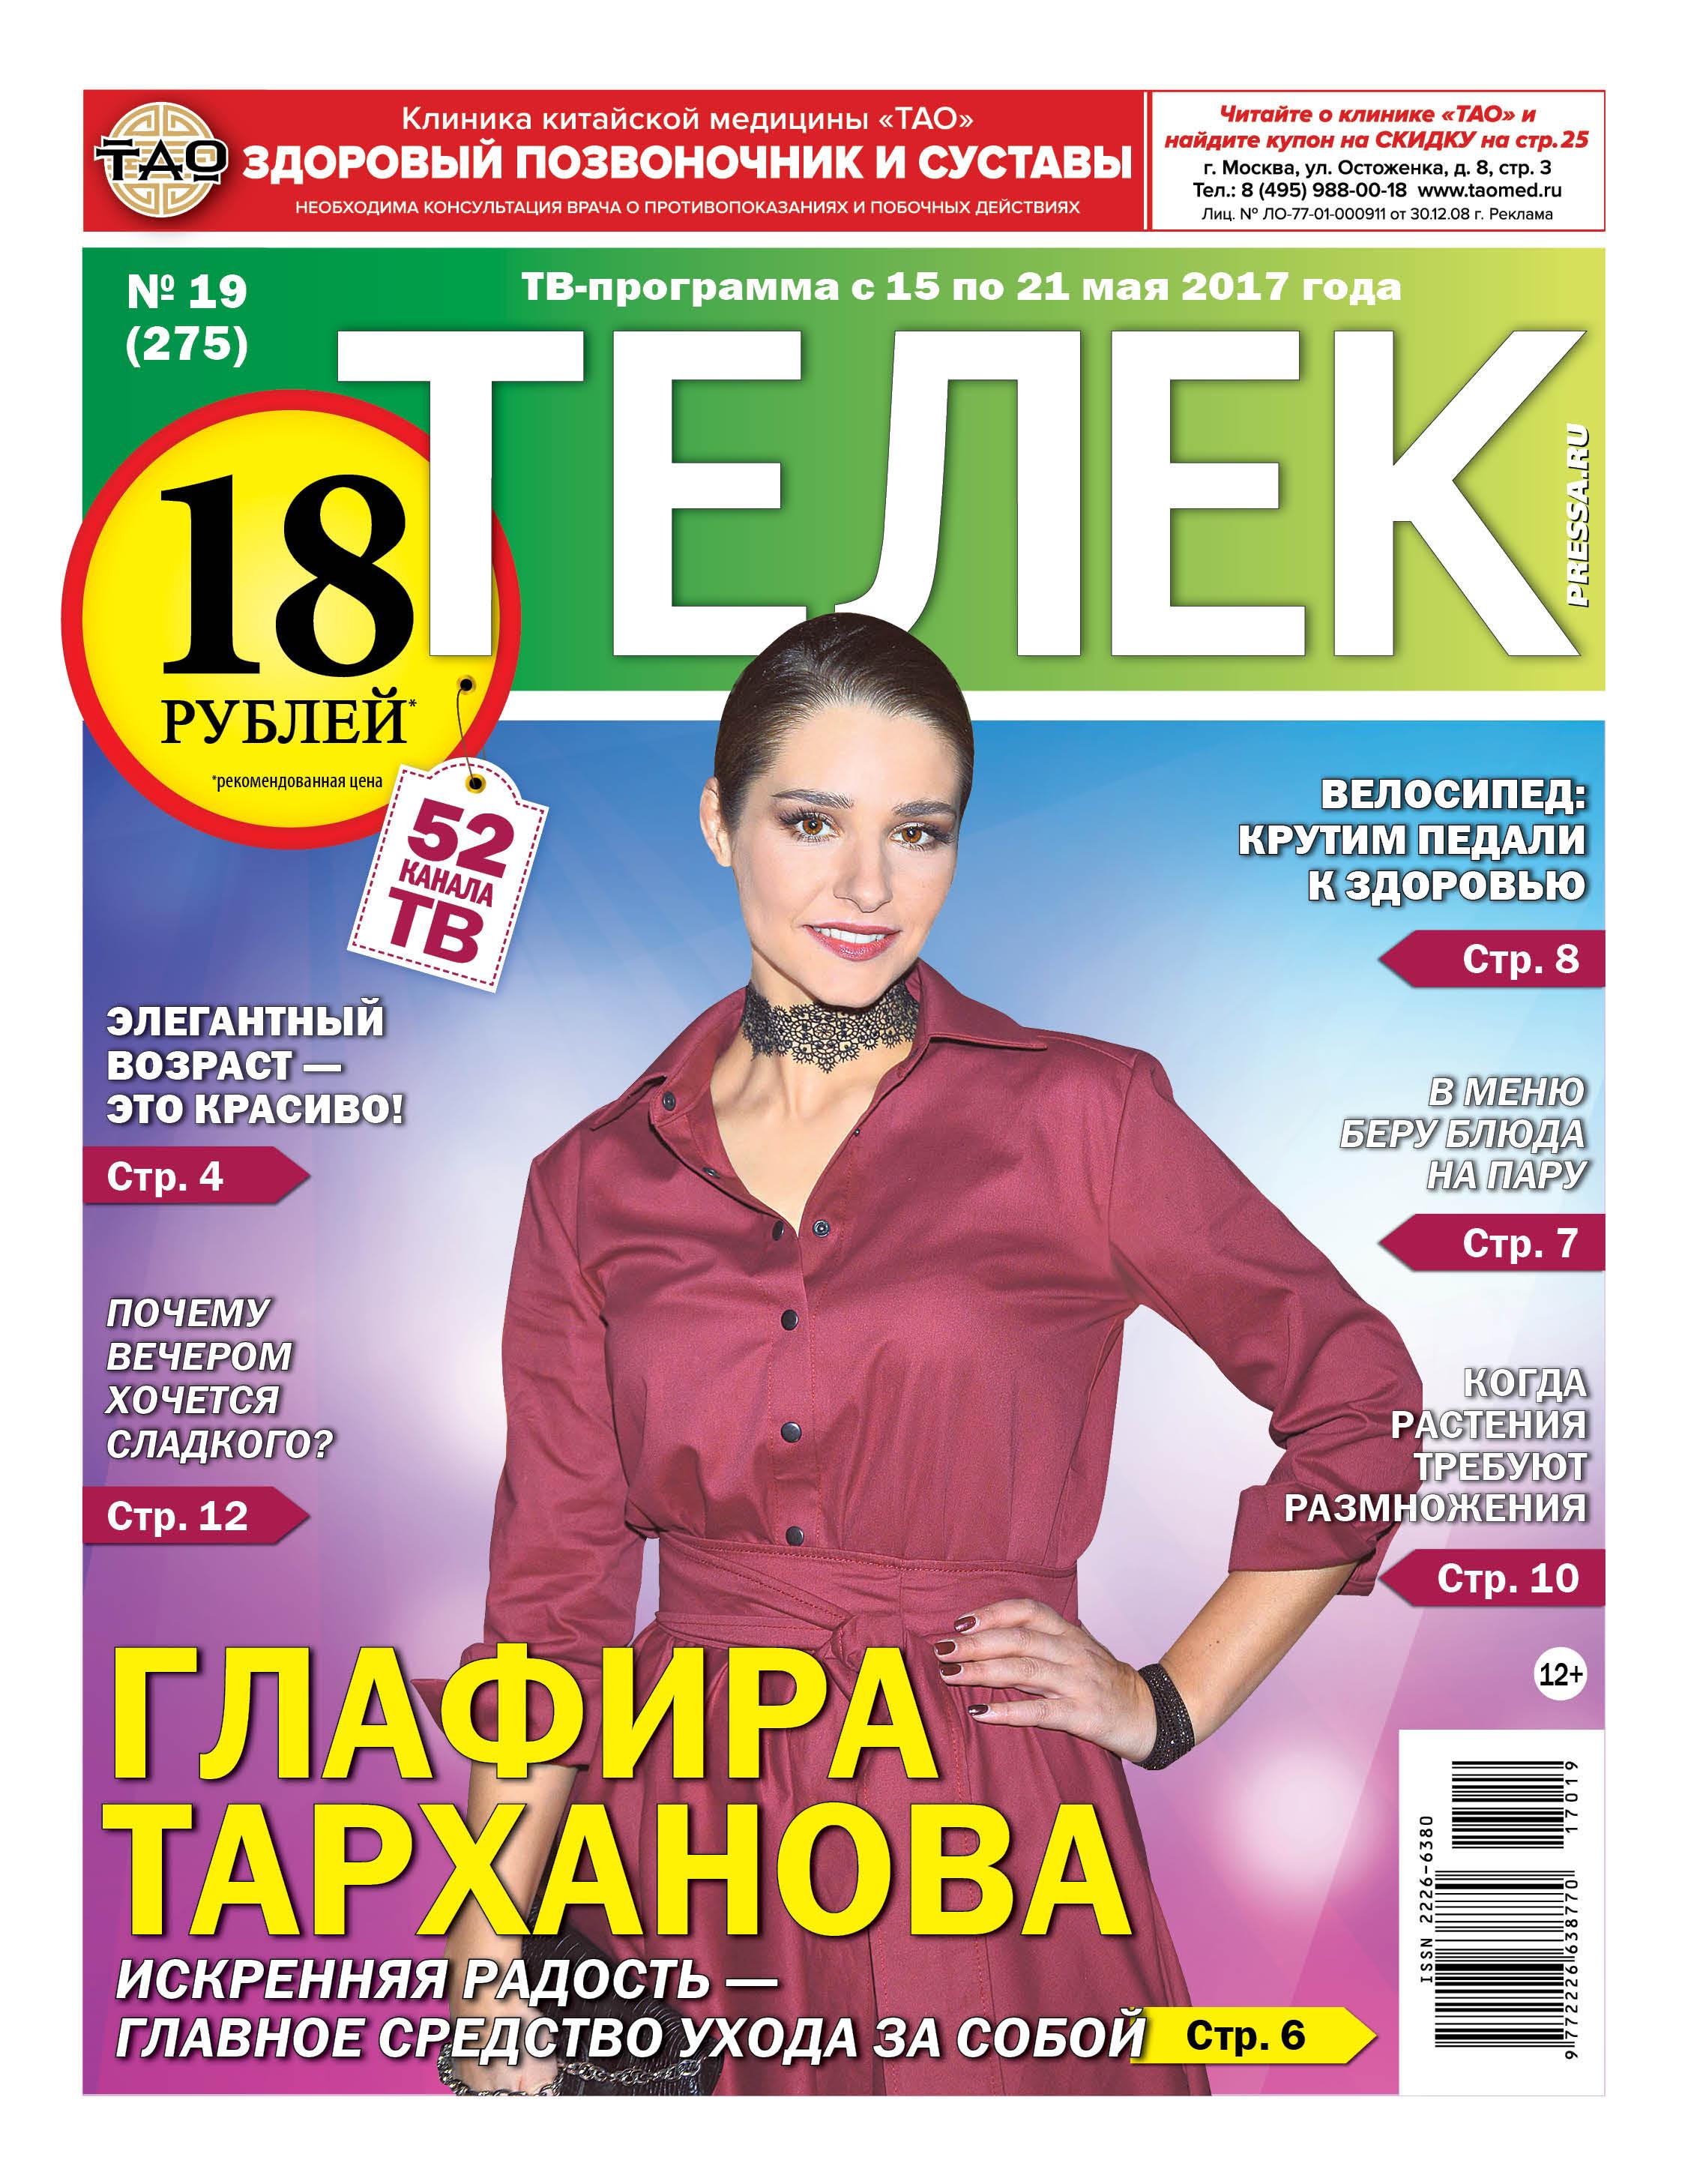 №19 (275) Глафира Тарханова